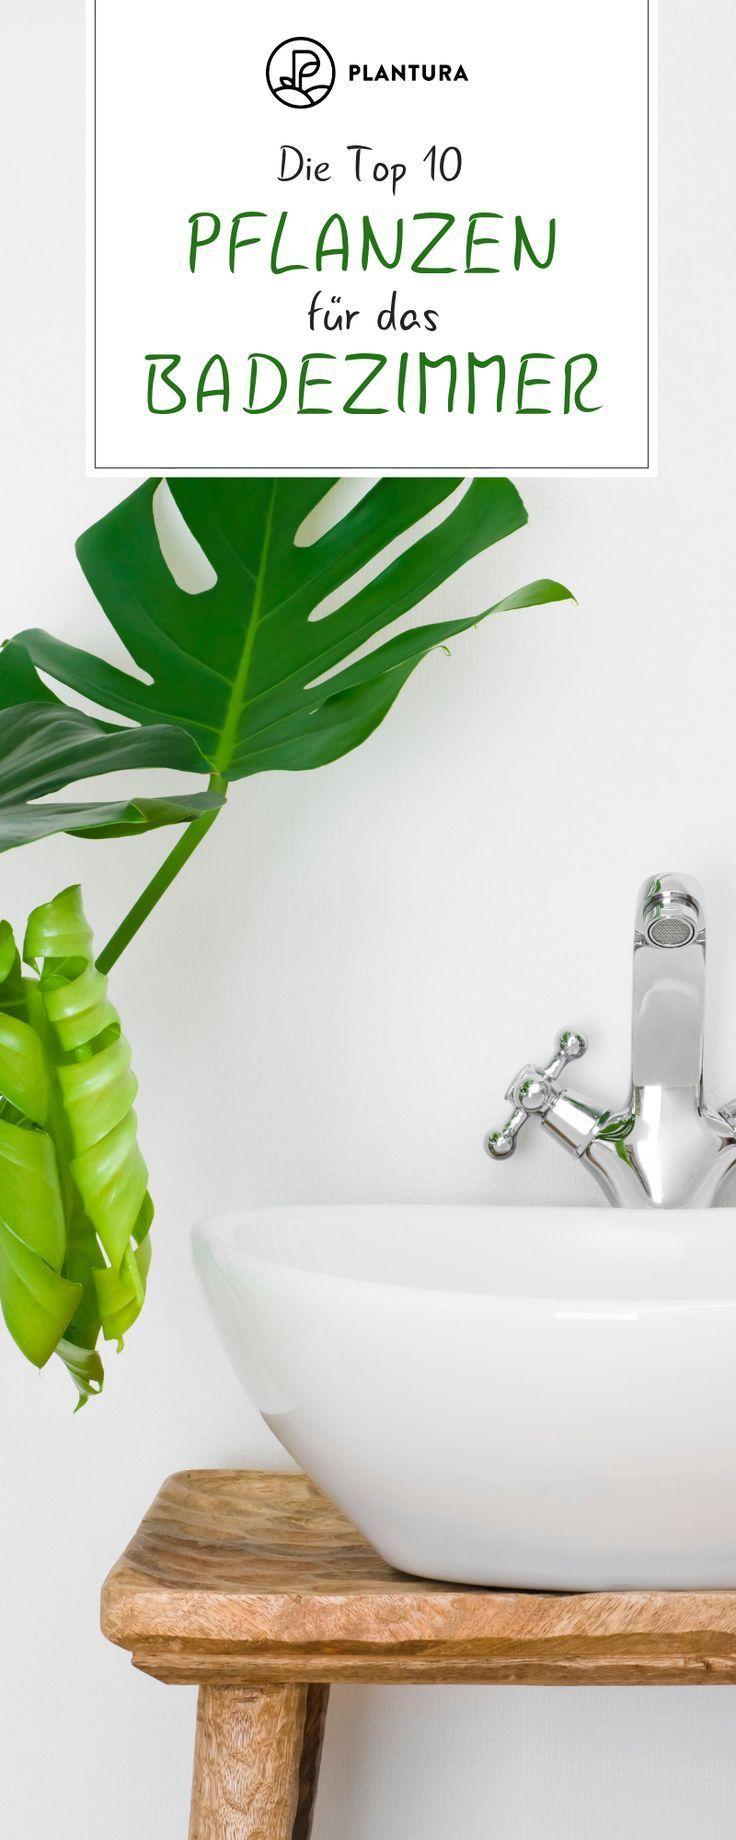 Pflanzen Furs Badezimmer Unsere Top 10 Badezimmer Furs Gesundepflanzenzimmerpflanze Pf Badezimm Pflanzen Furs Bad Pflanzen Badezimmer Ohne Fenster